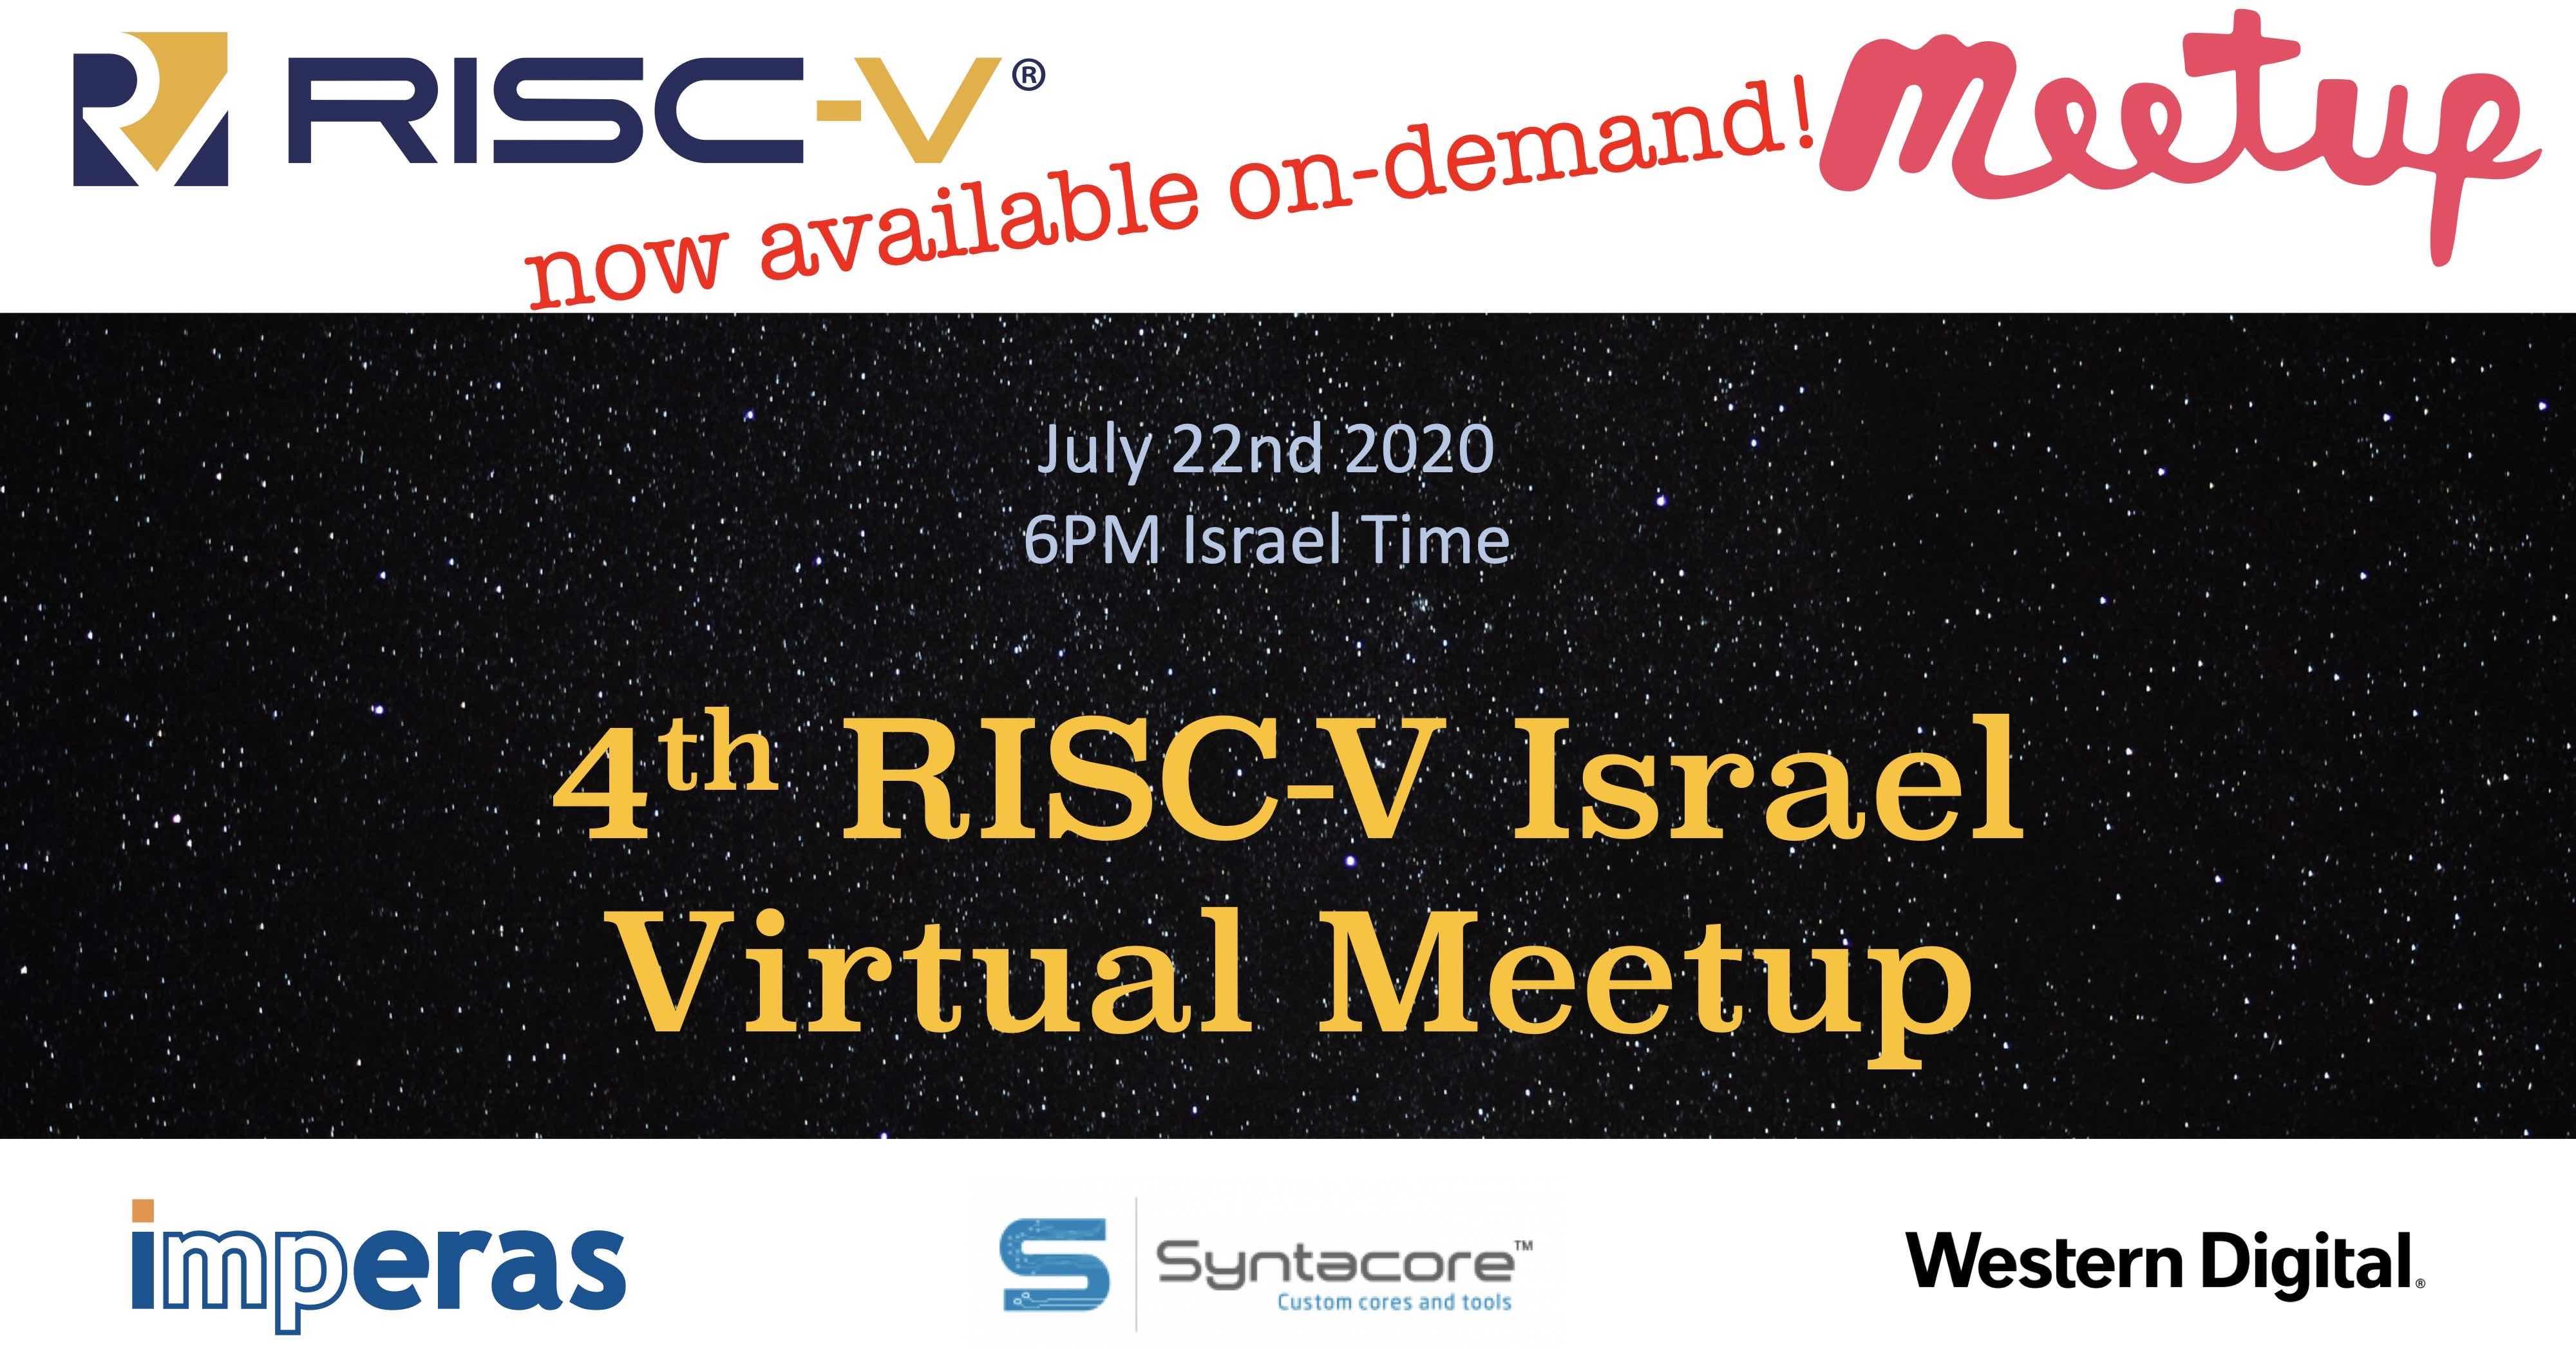 RISC-V Israel Virtual Meetup, July 22 2020